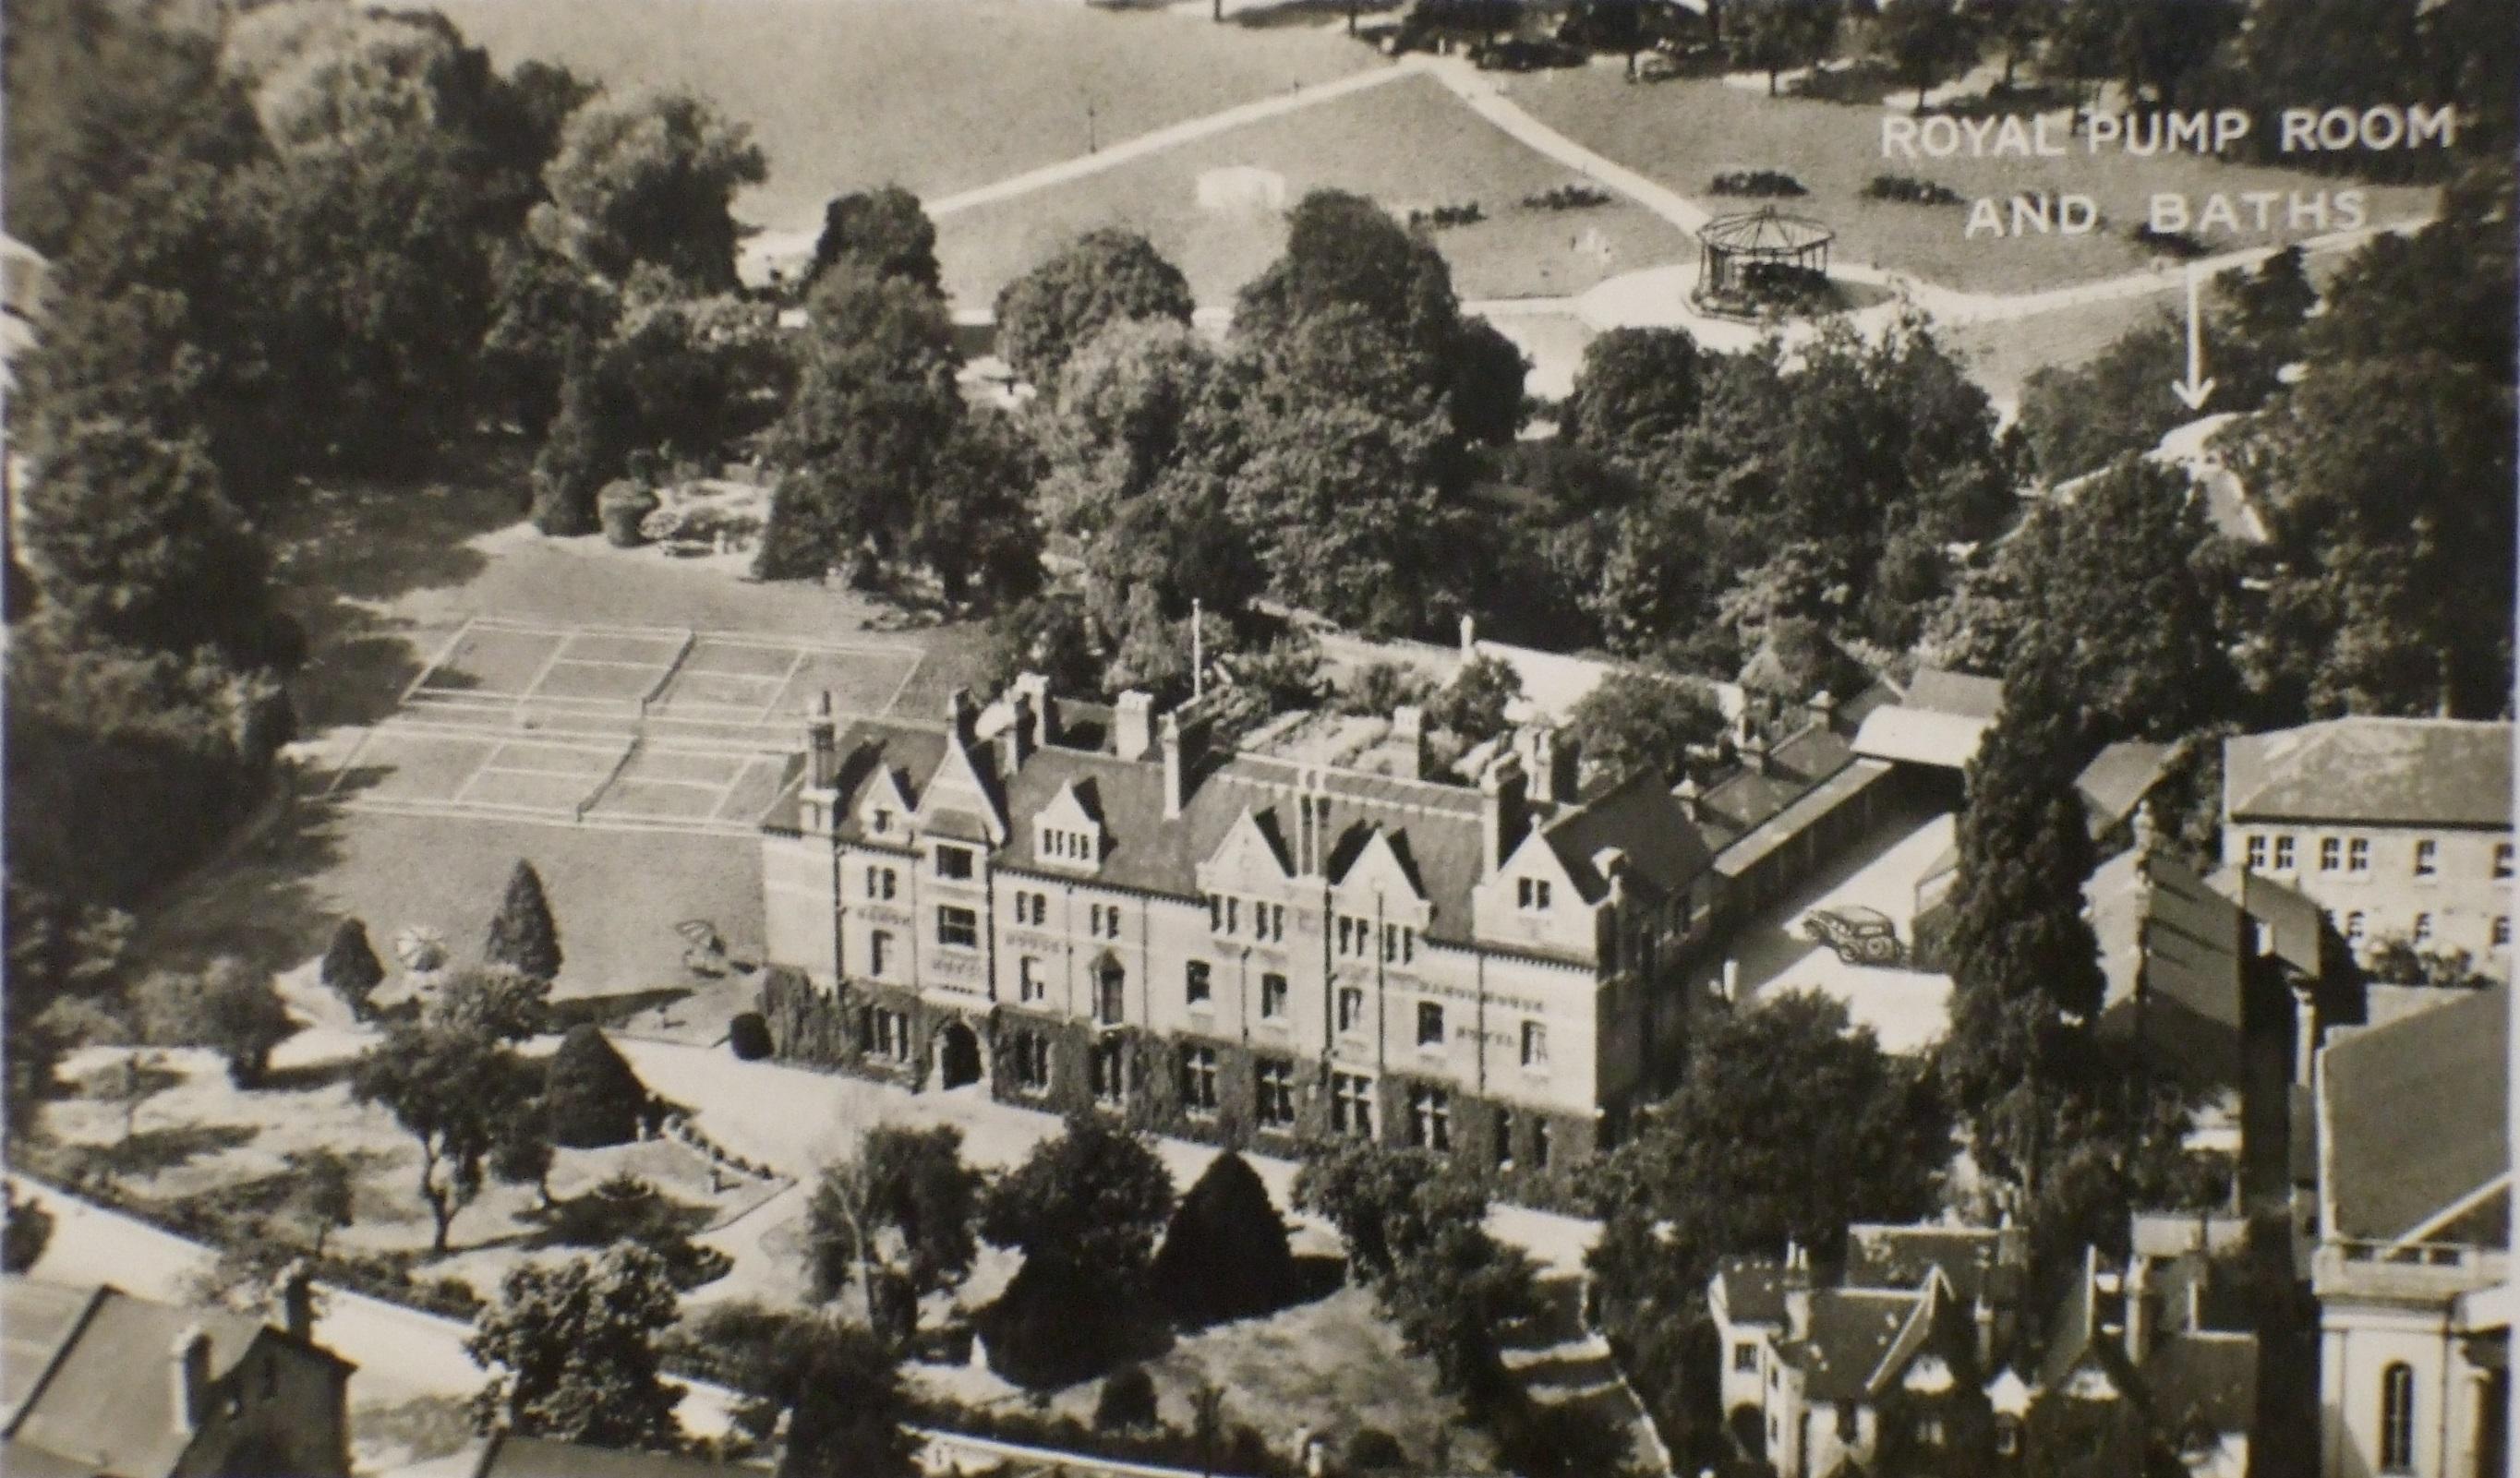 Manor House Leamington Spa History